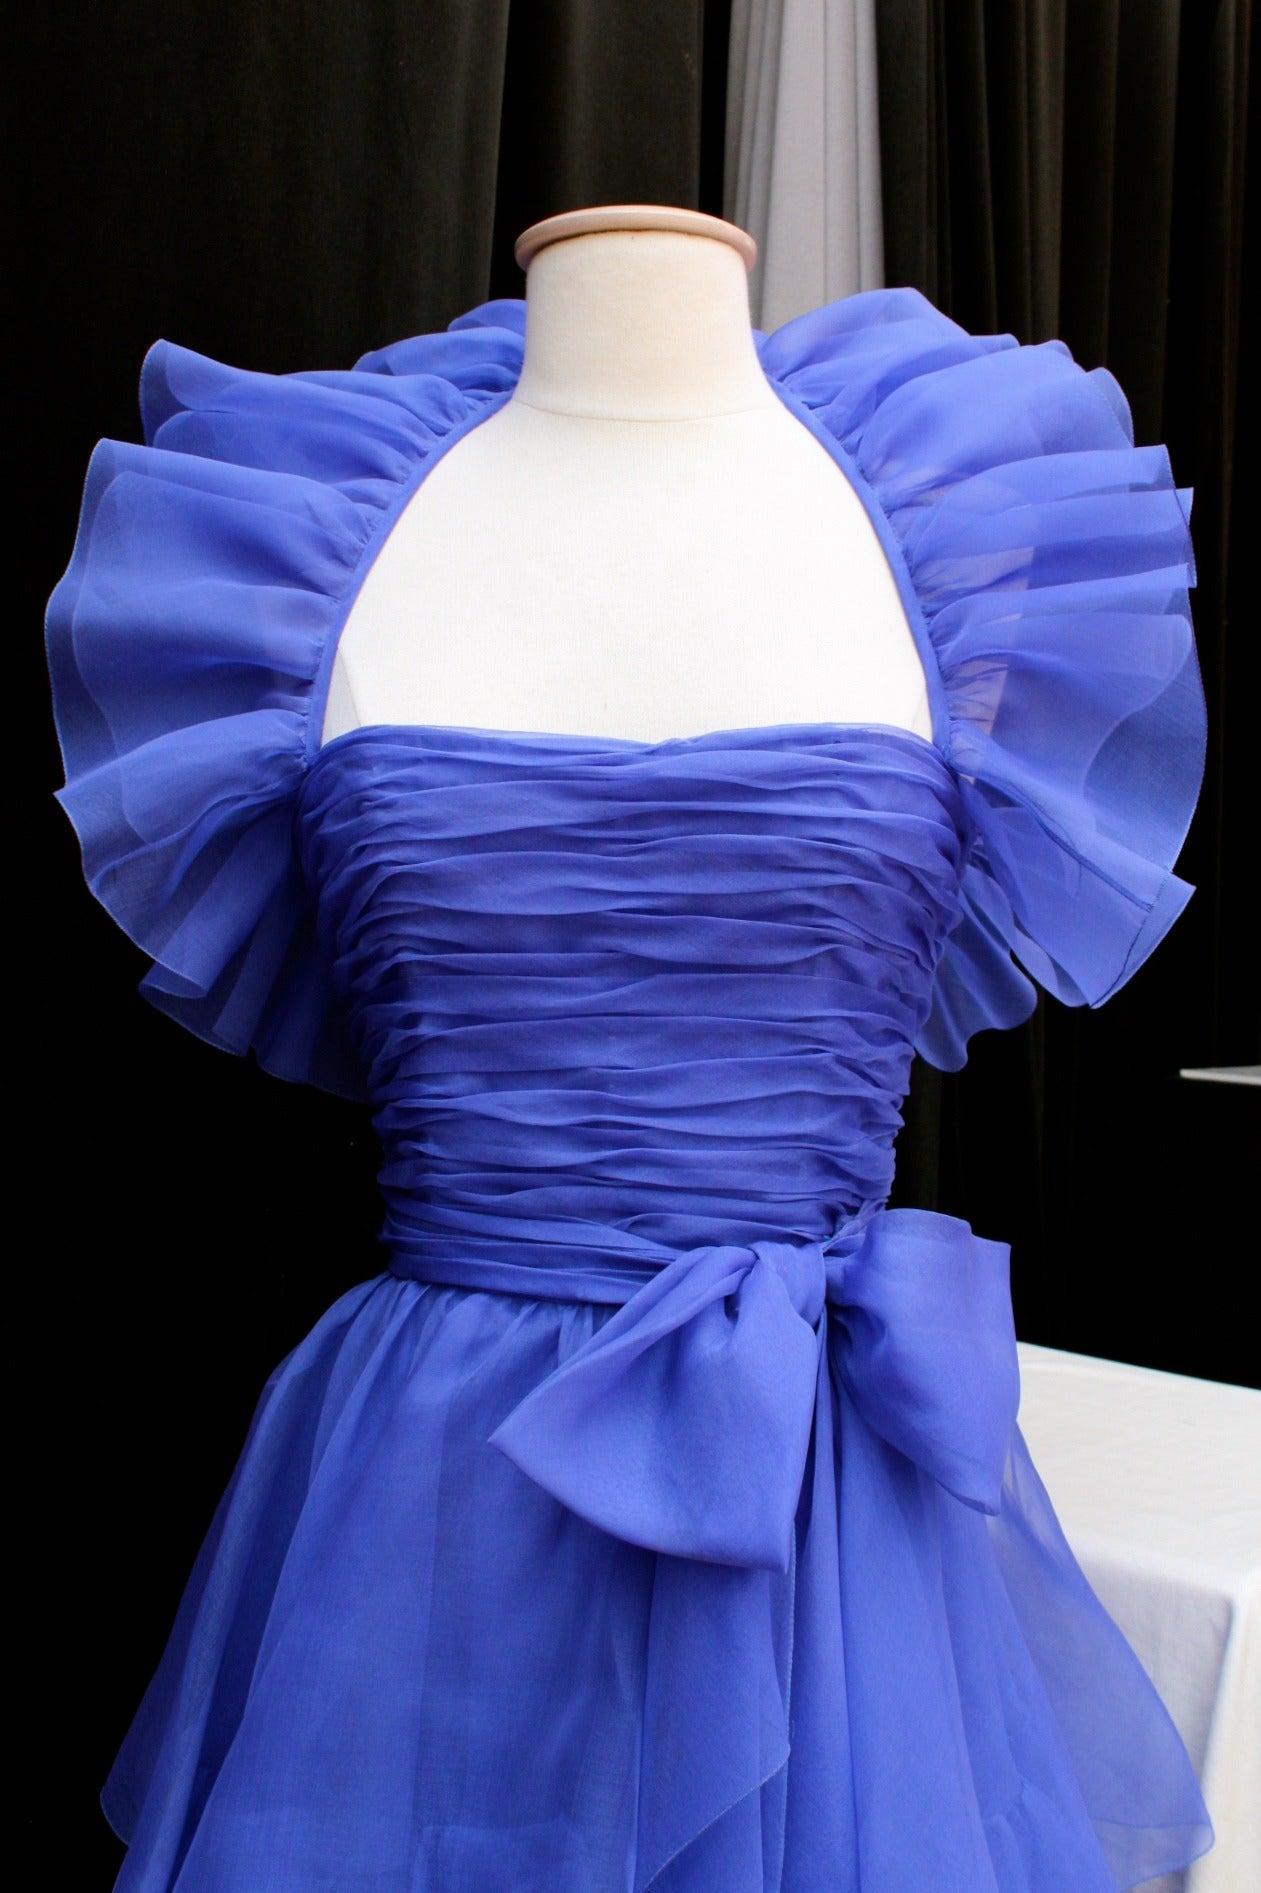 Jean-Louis Scherrer Haute Couture Blue Organza Evening Gown, 1980s  For Sale 1